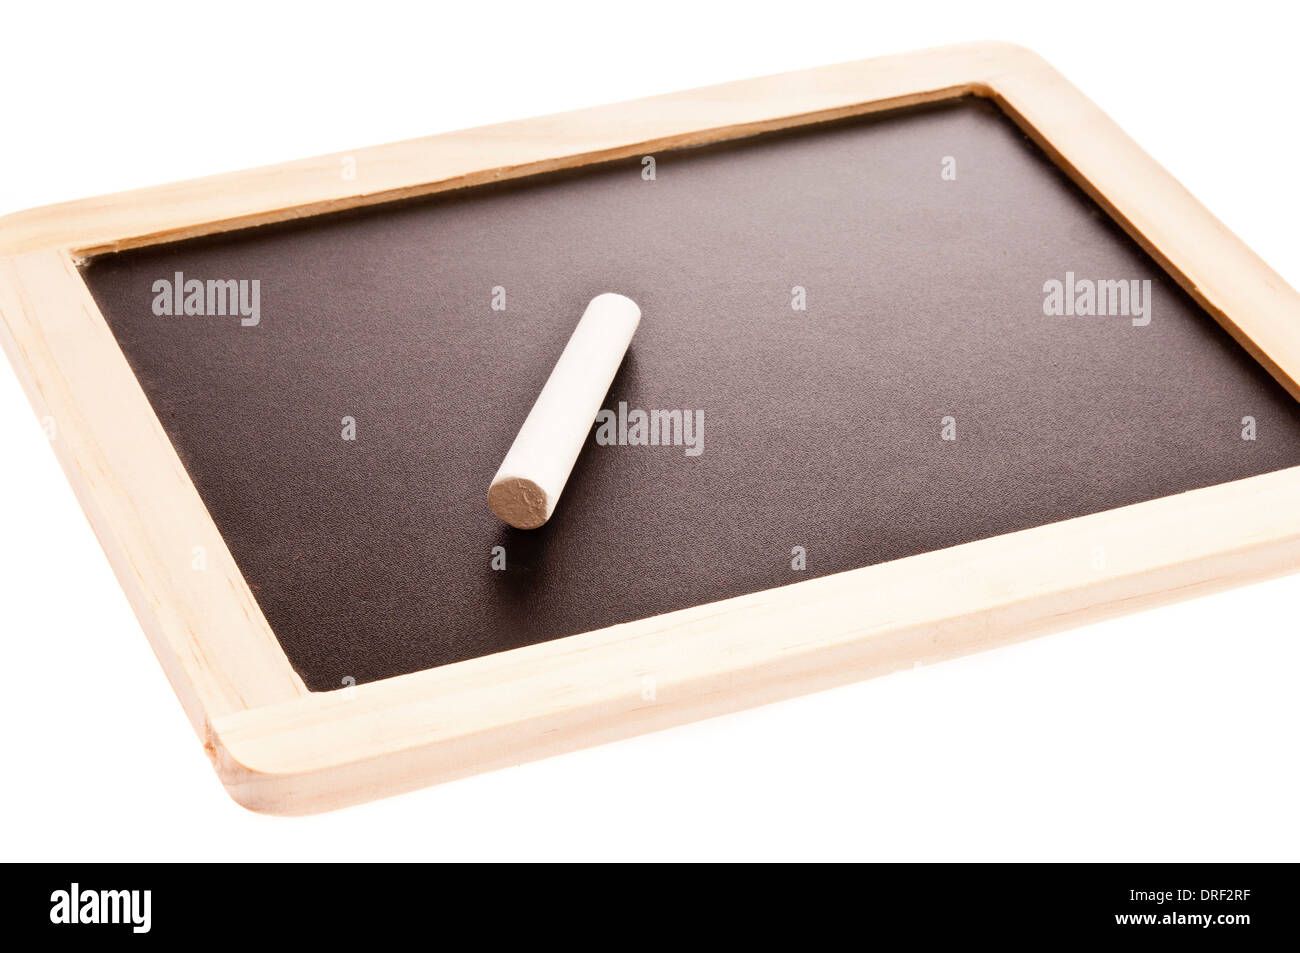 portable chalkboard - Stock Image